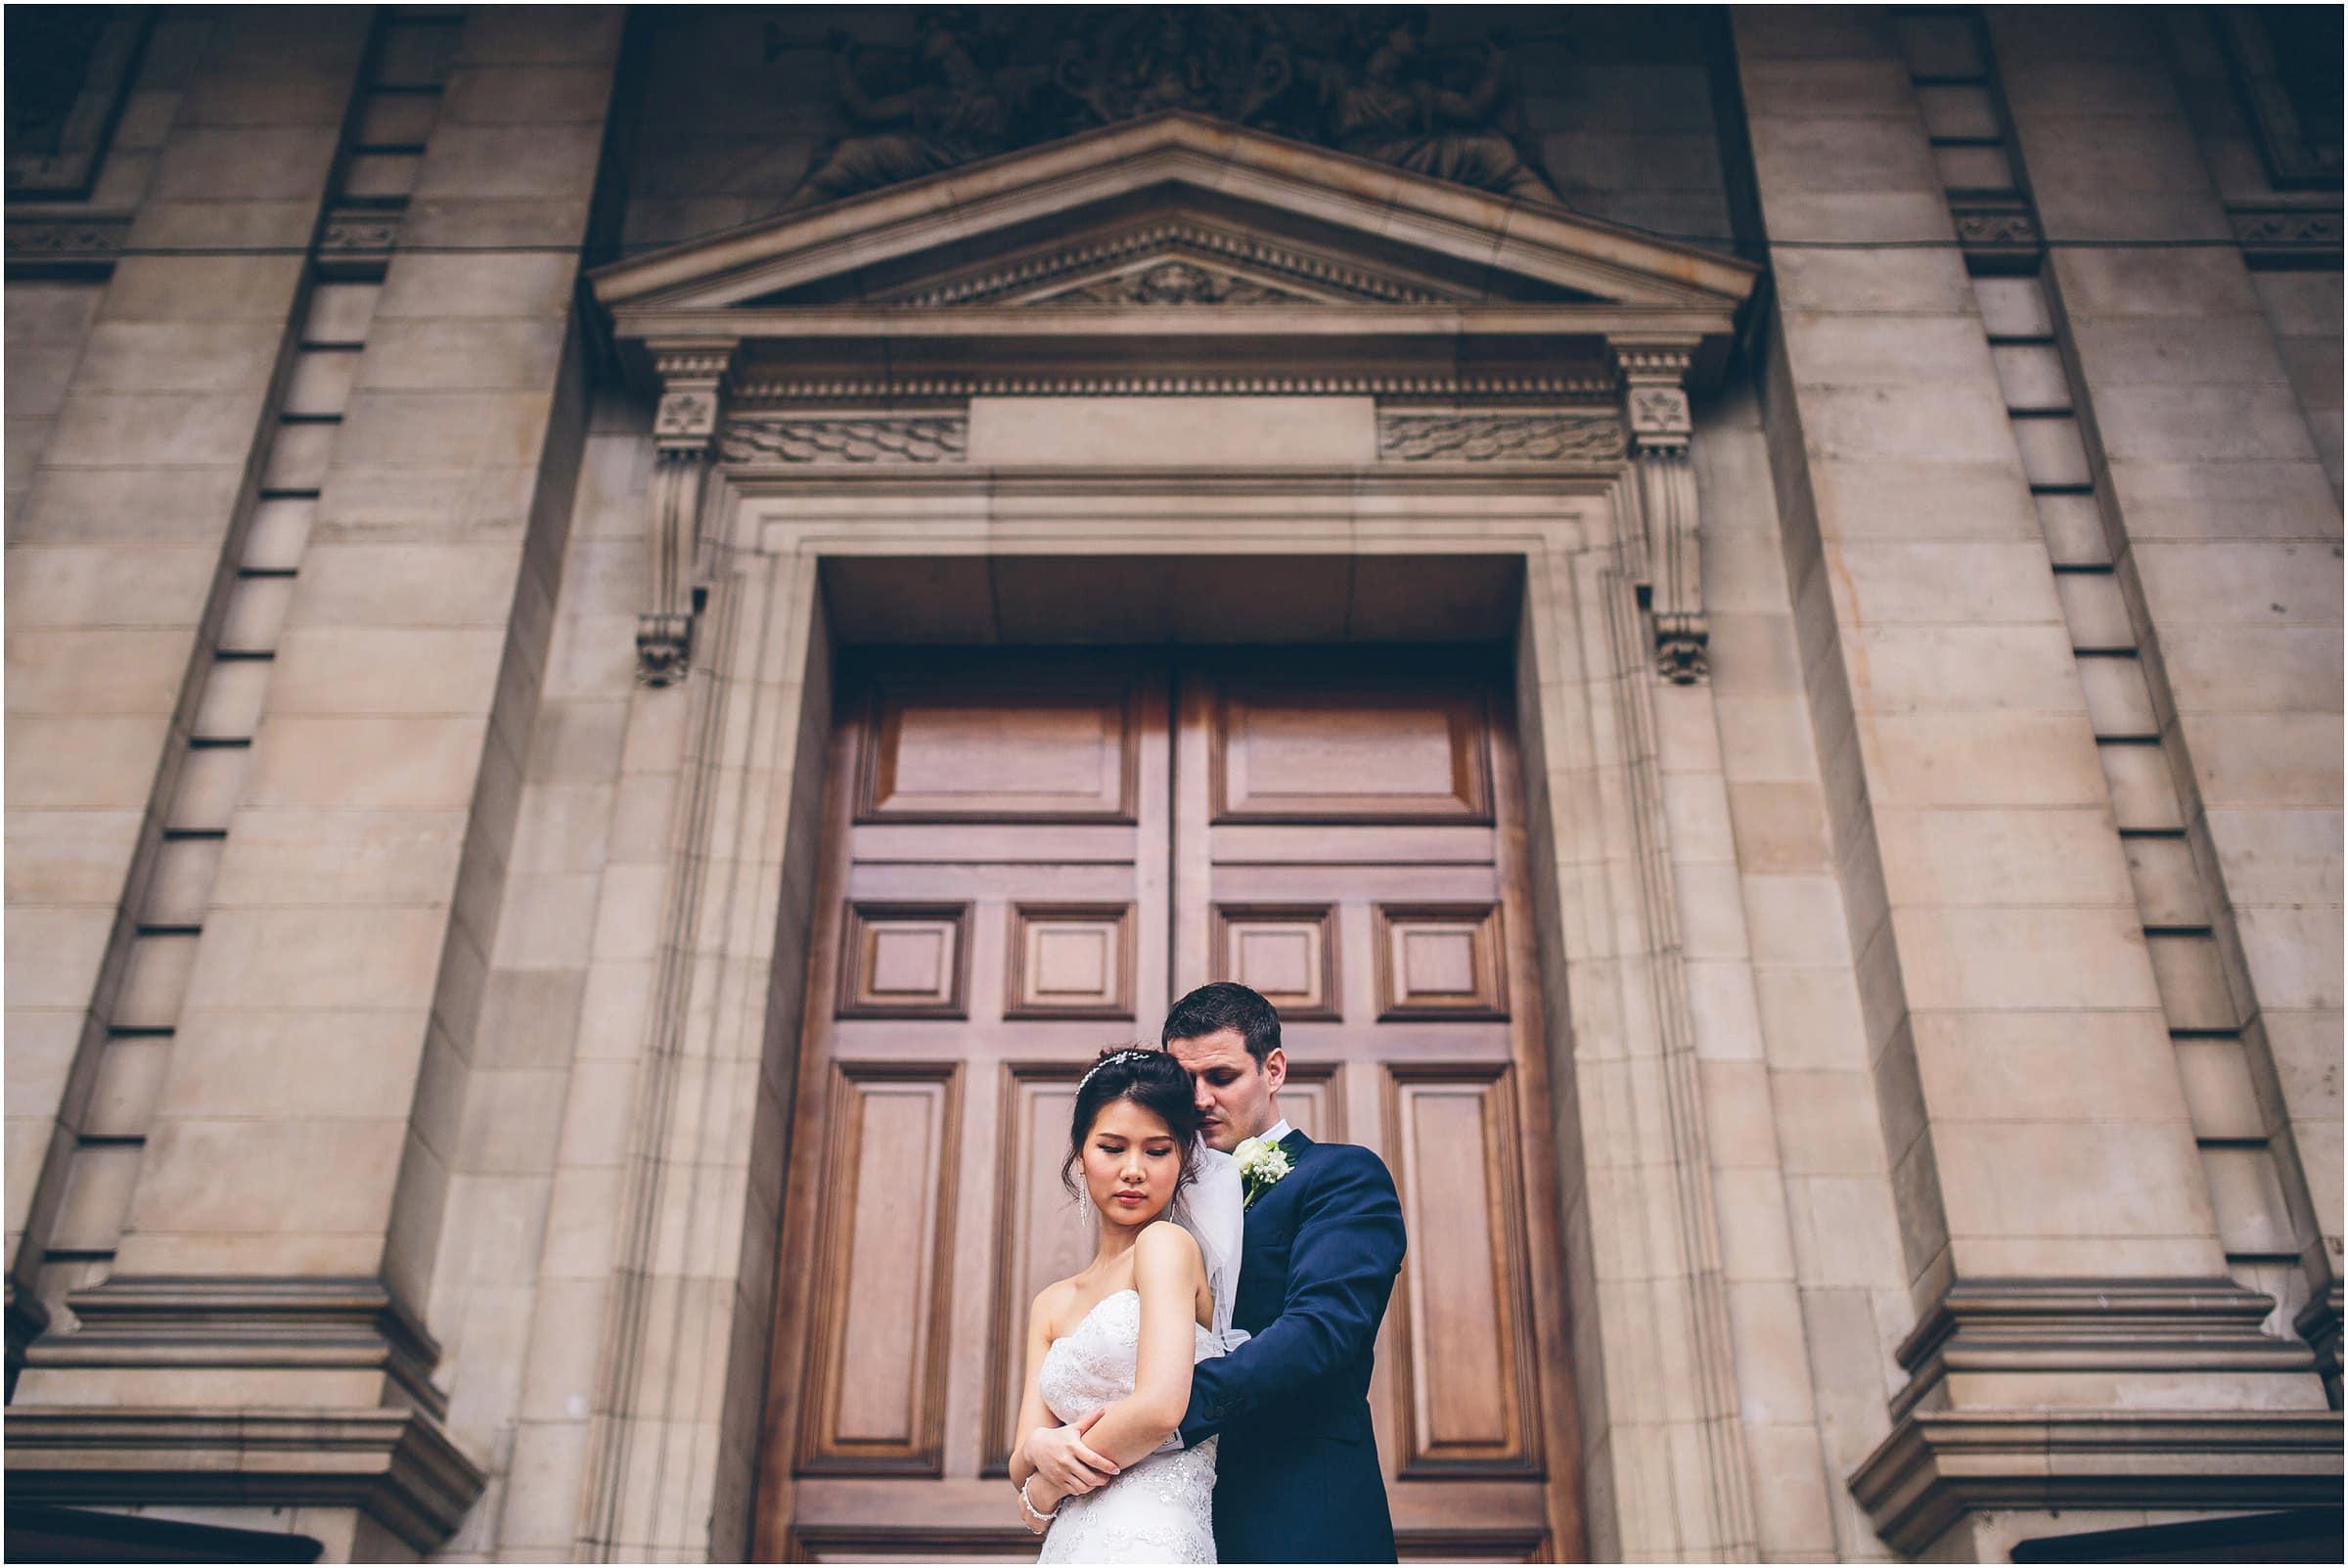 Royal_Horseguards_Wedding_Photography_0048